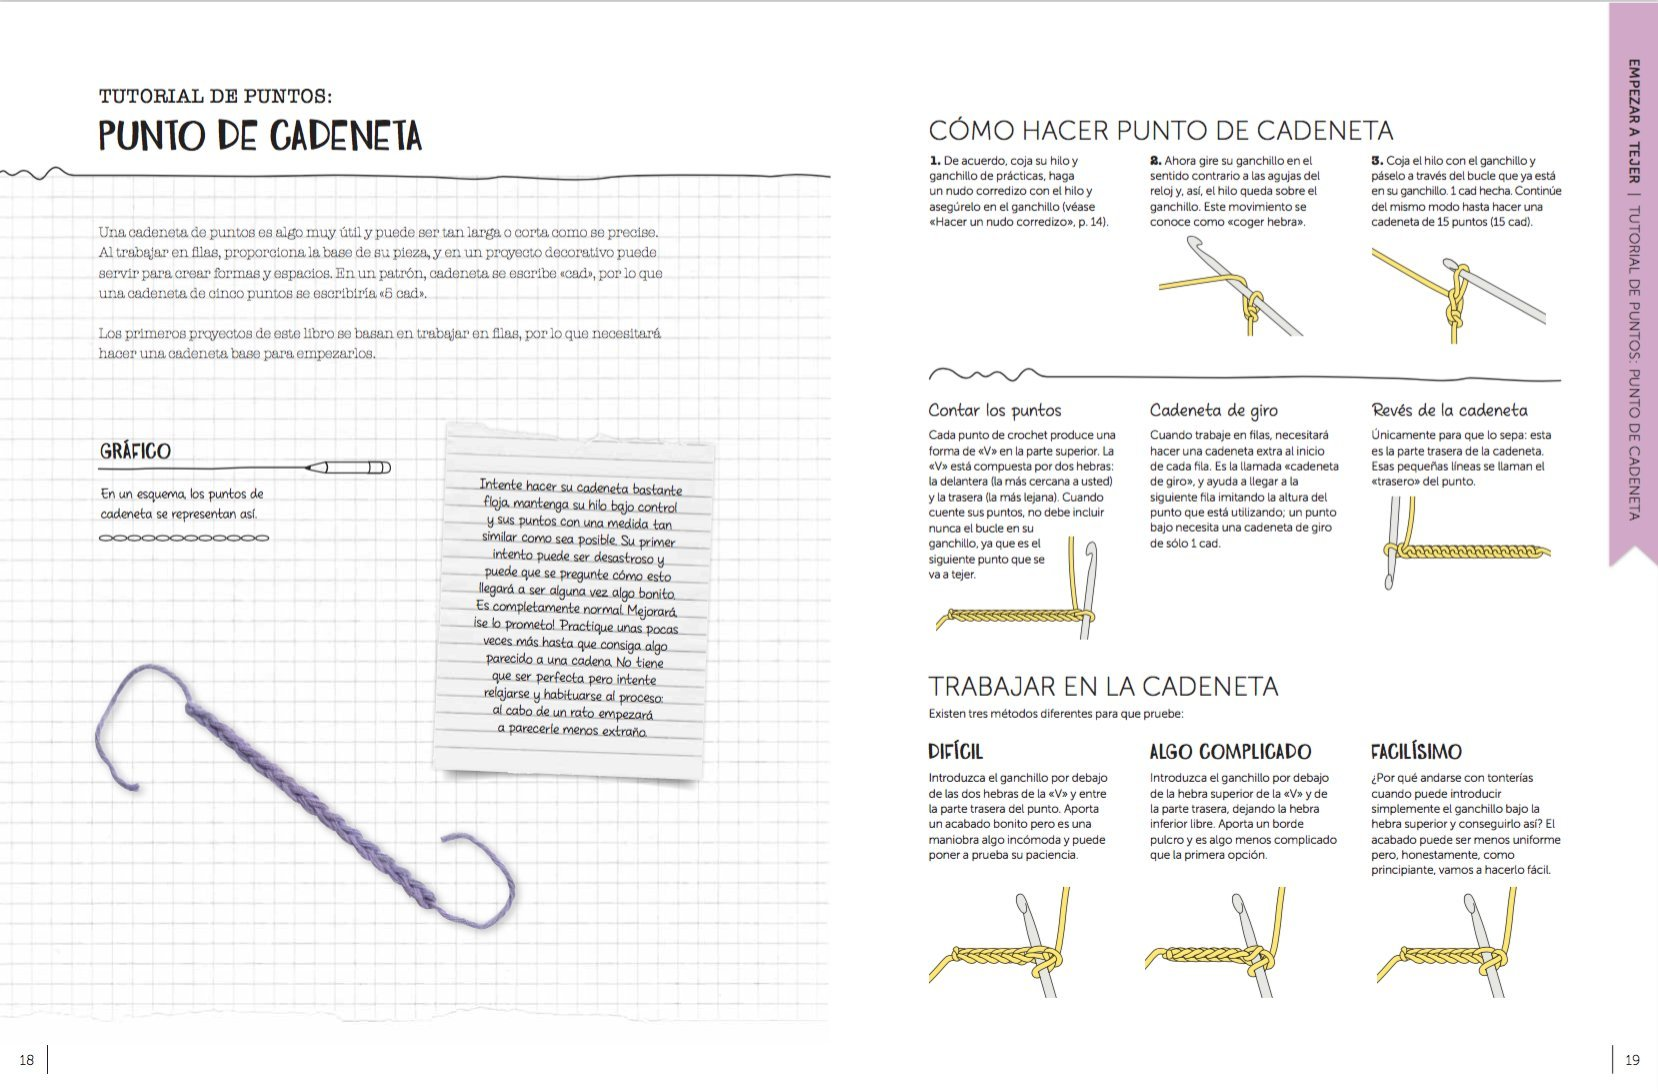 Ganchillo para principiantes: 20 proyectos para aprender a tejer (Spanish Edition): Sarah Shrimpton: 9788416407101: Amazon.com: Books